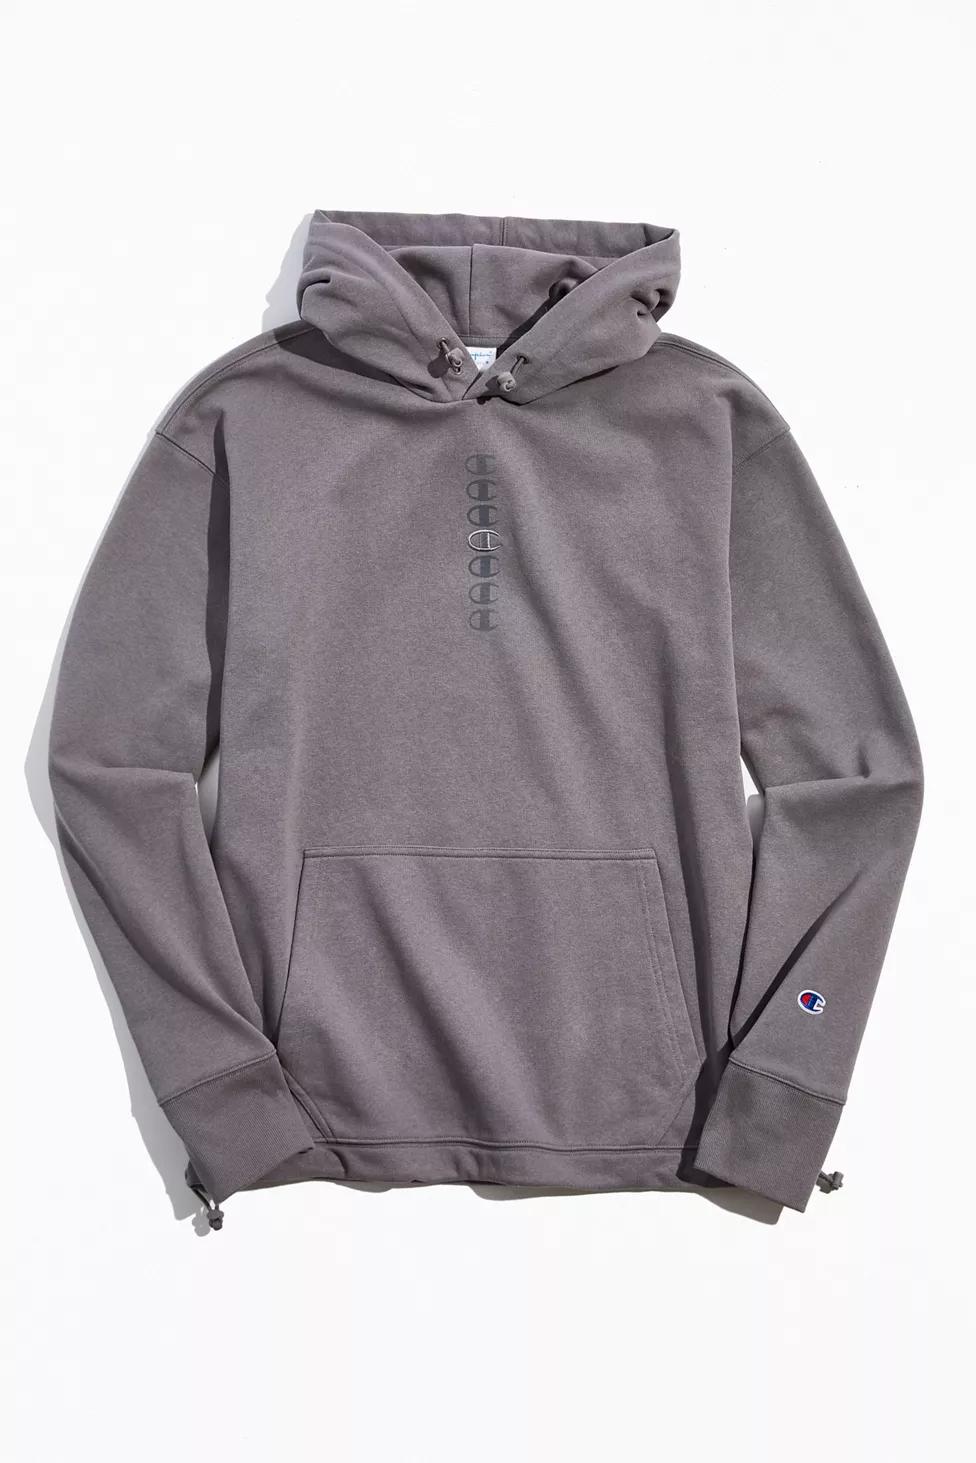 Champion Uo Exclusive Lightweight Reverse Weave Hoodie Sweatshirt Urban Outfitters Sweatshirts Hoodie Hoodies Sweatshirts [ 1463 x 976 Pixel ]